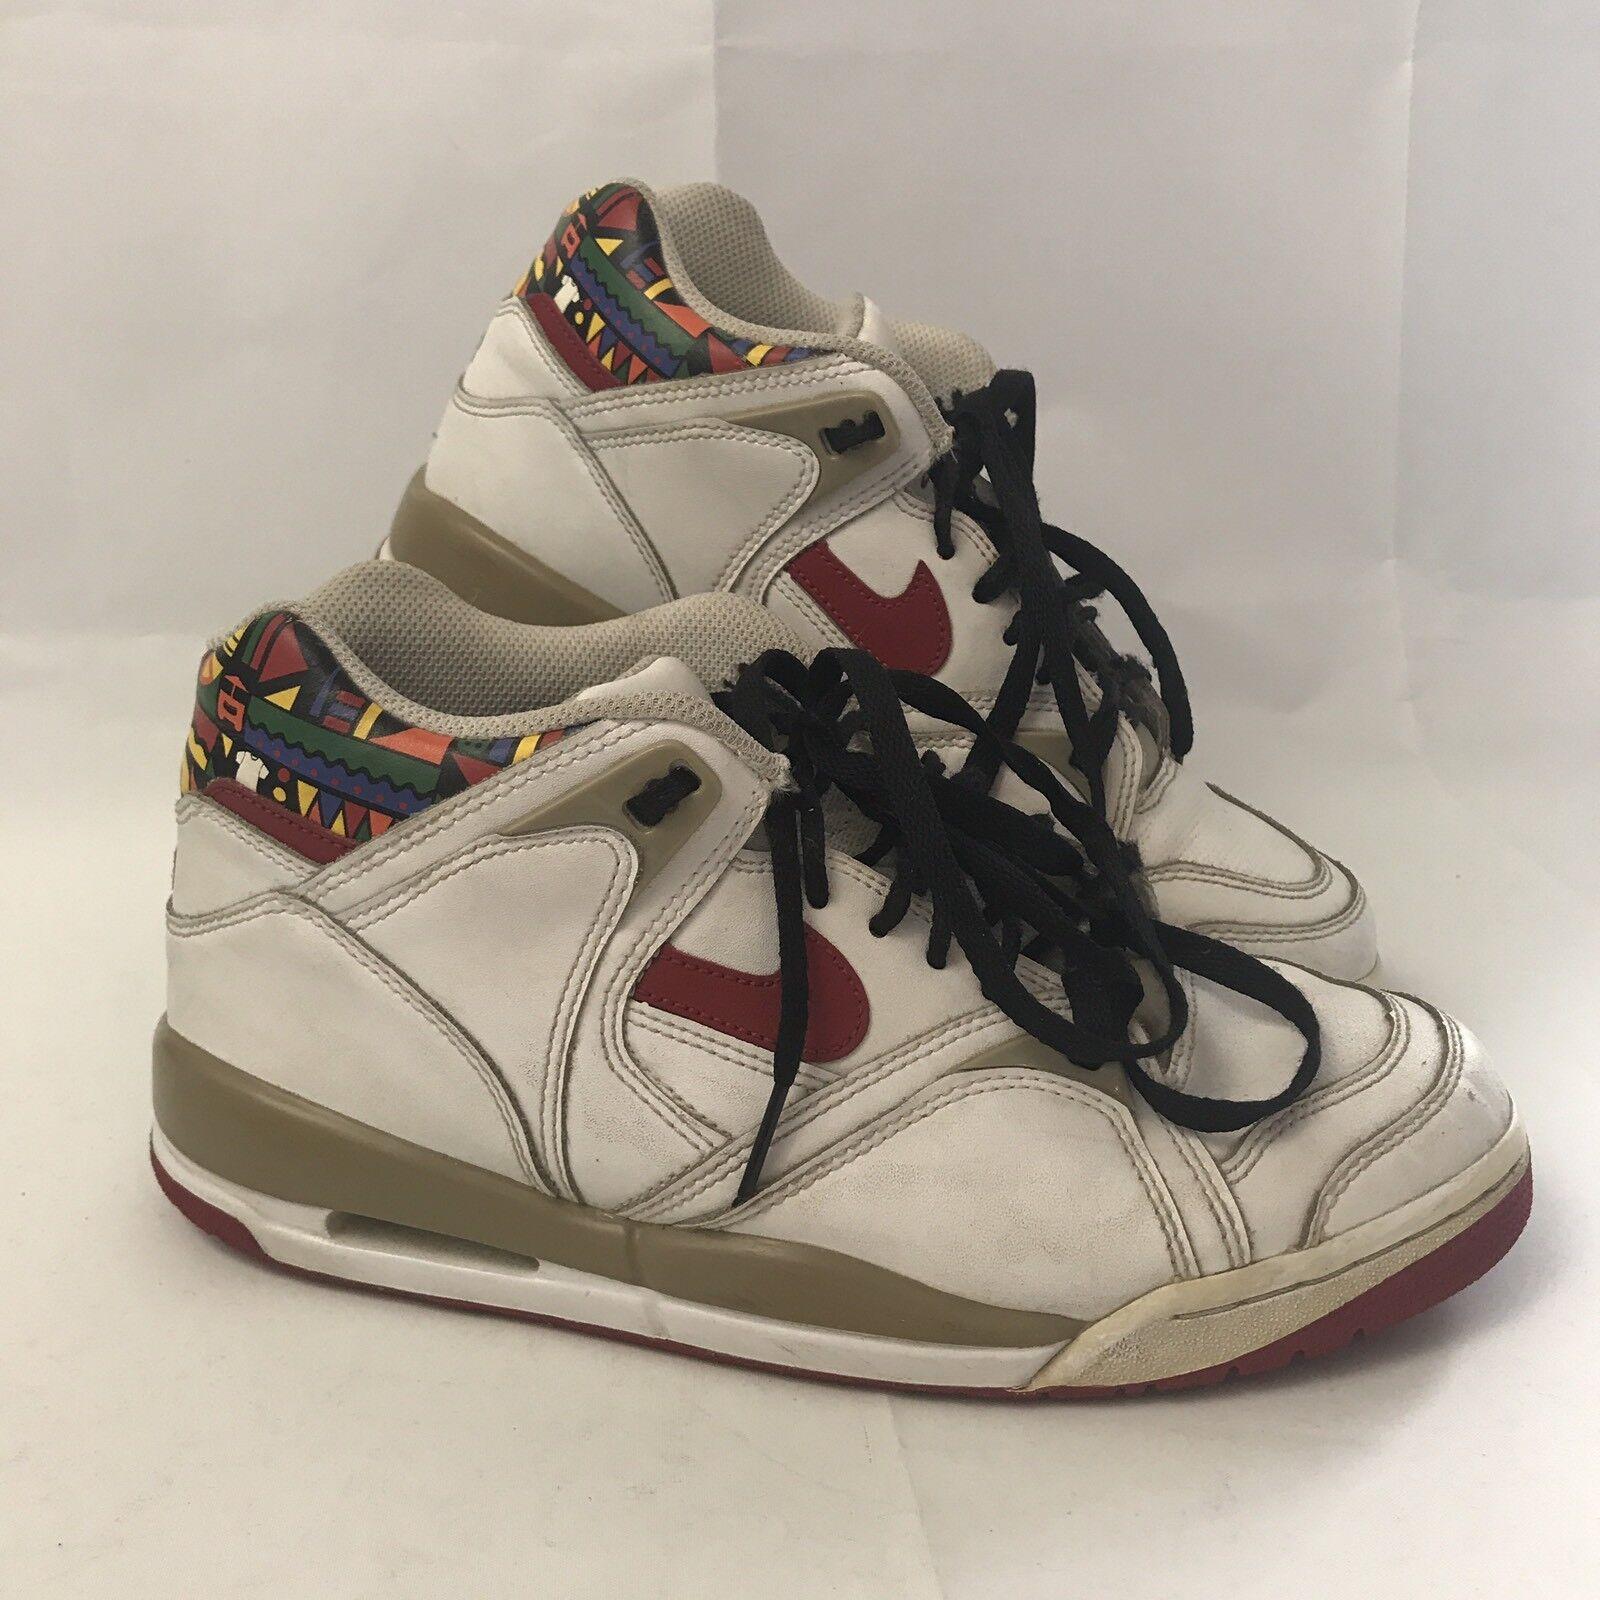 Nike Air Retro Geometric White Mens 2008 Mid High Top Shoes Sneakers Sz 8.5 Seasonal clearance sale